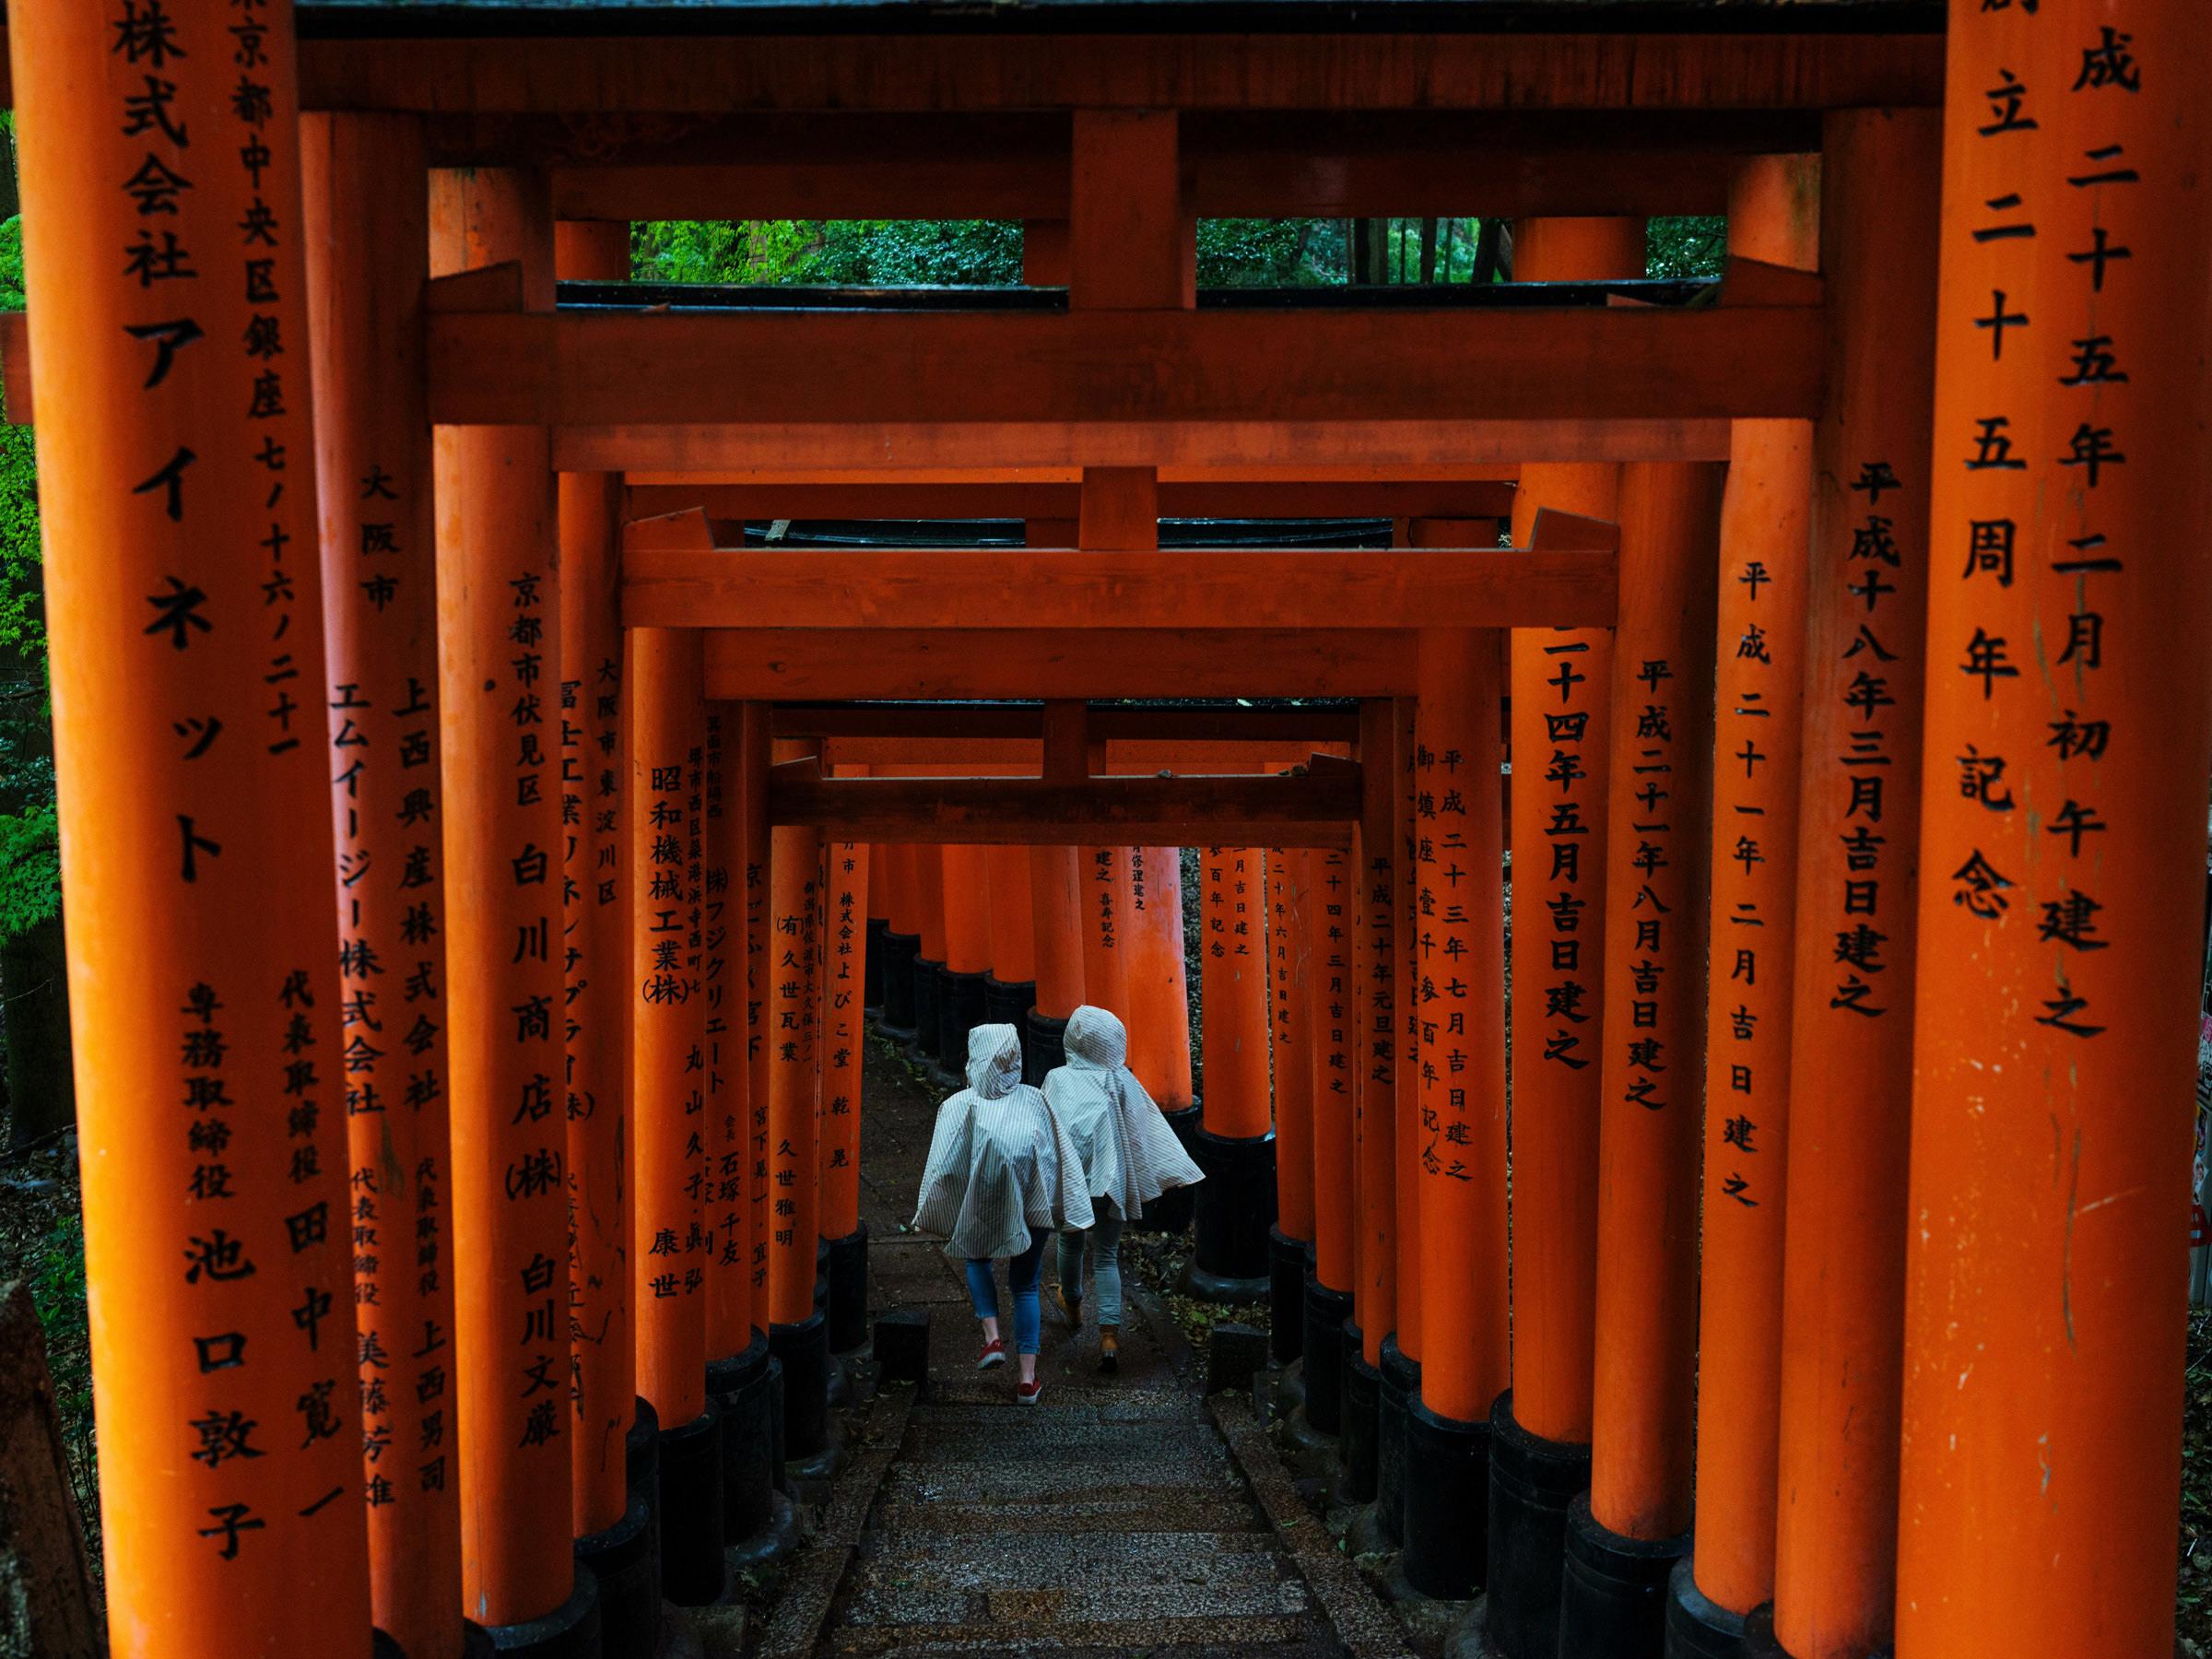 Fujifilm-GFX-Japan-Street-Photography-14